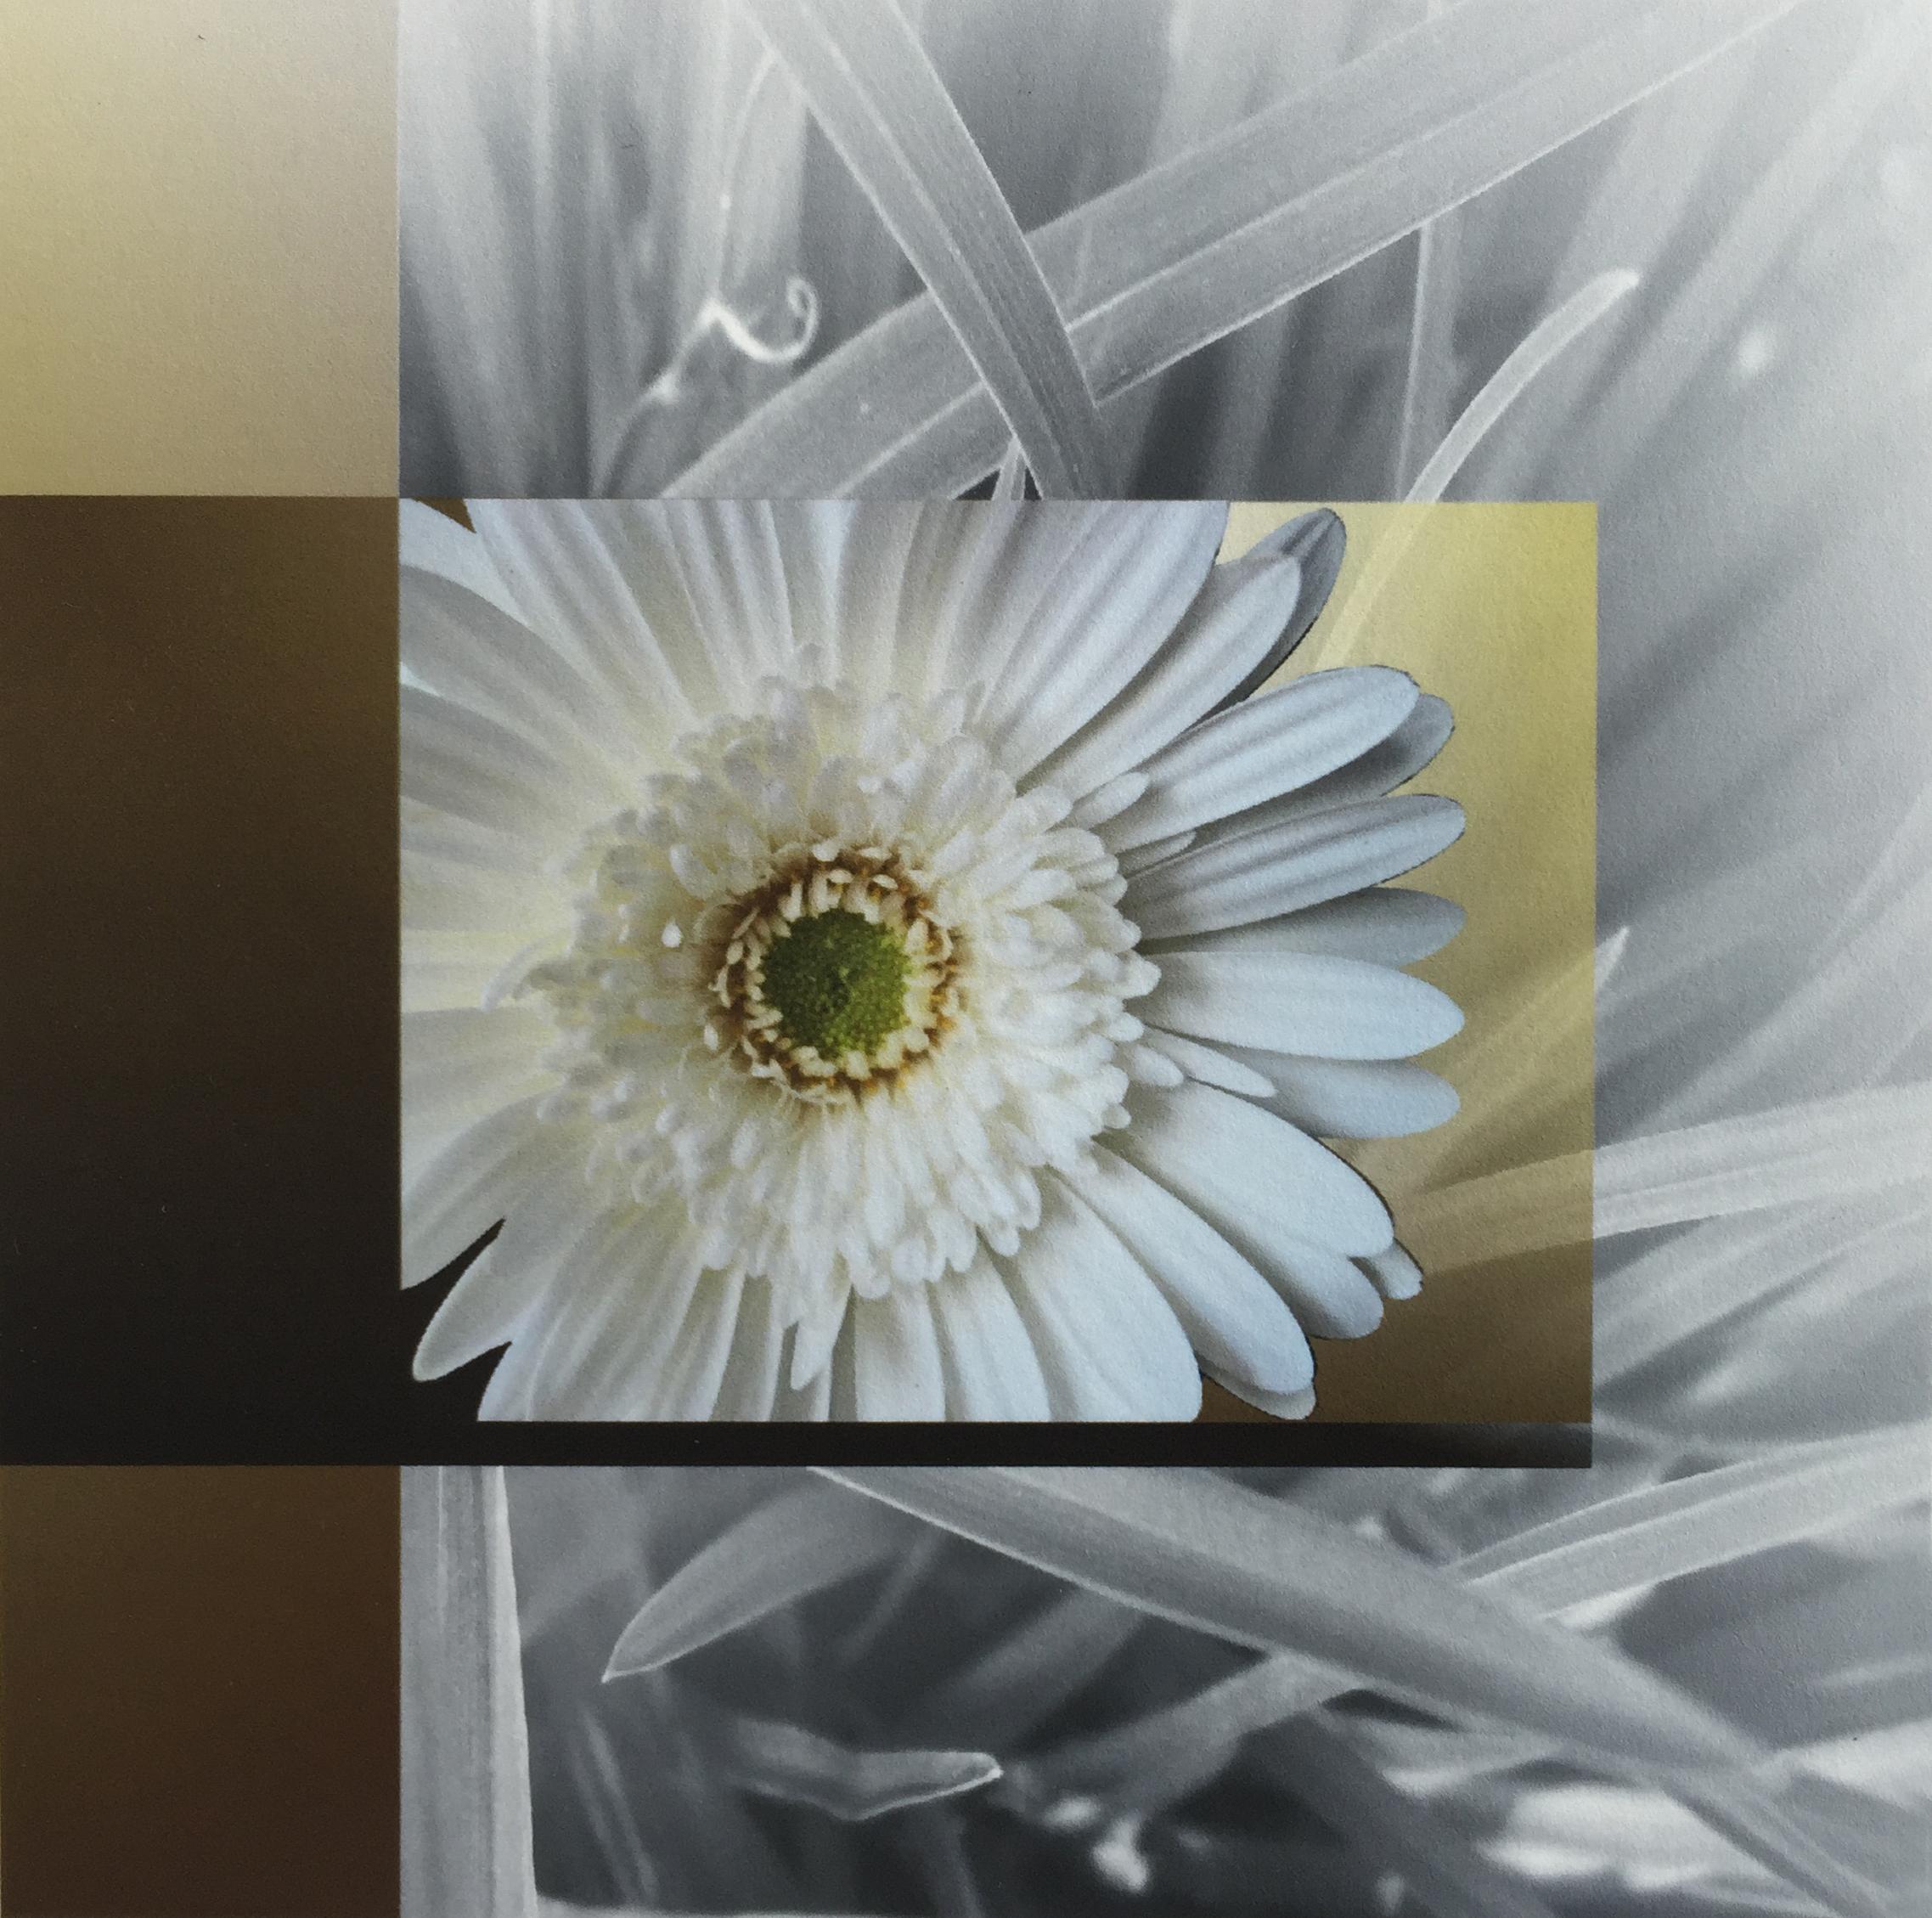 20160330-gerbera-daisy-collection-1-jpg.jpg